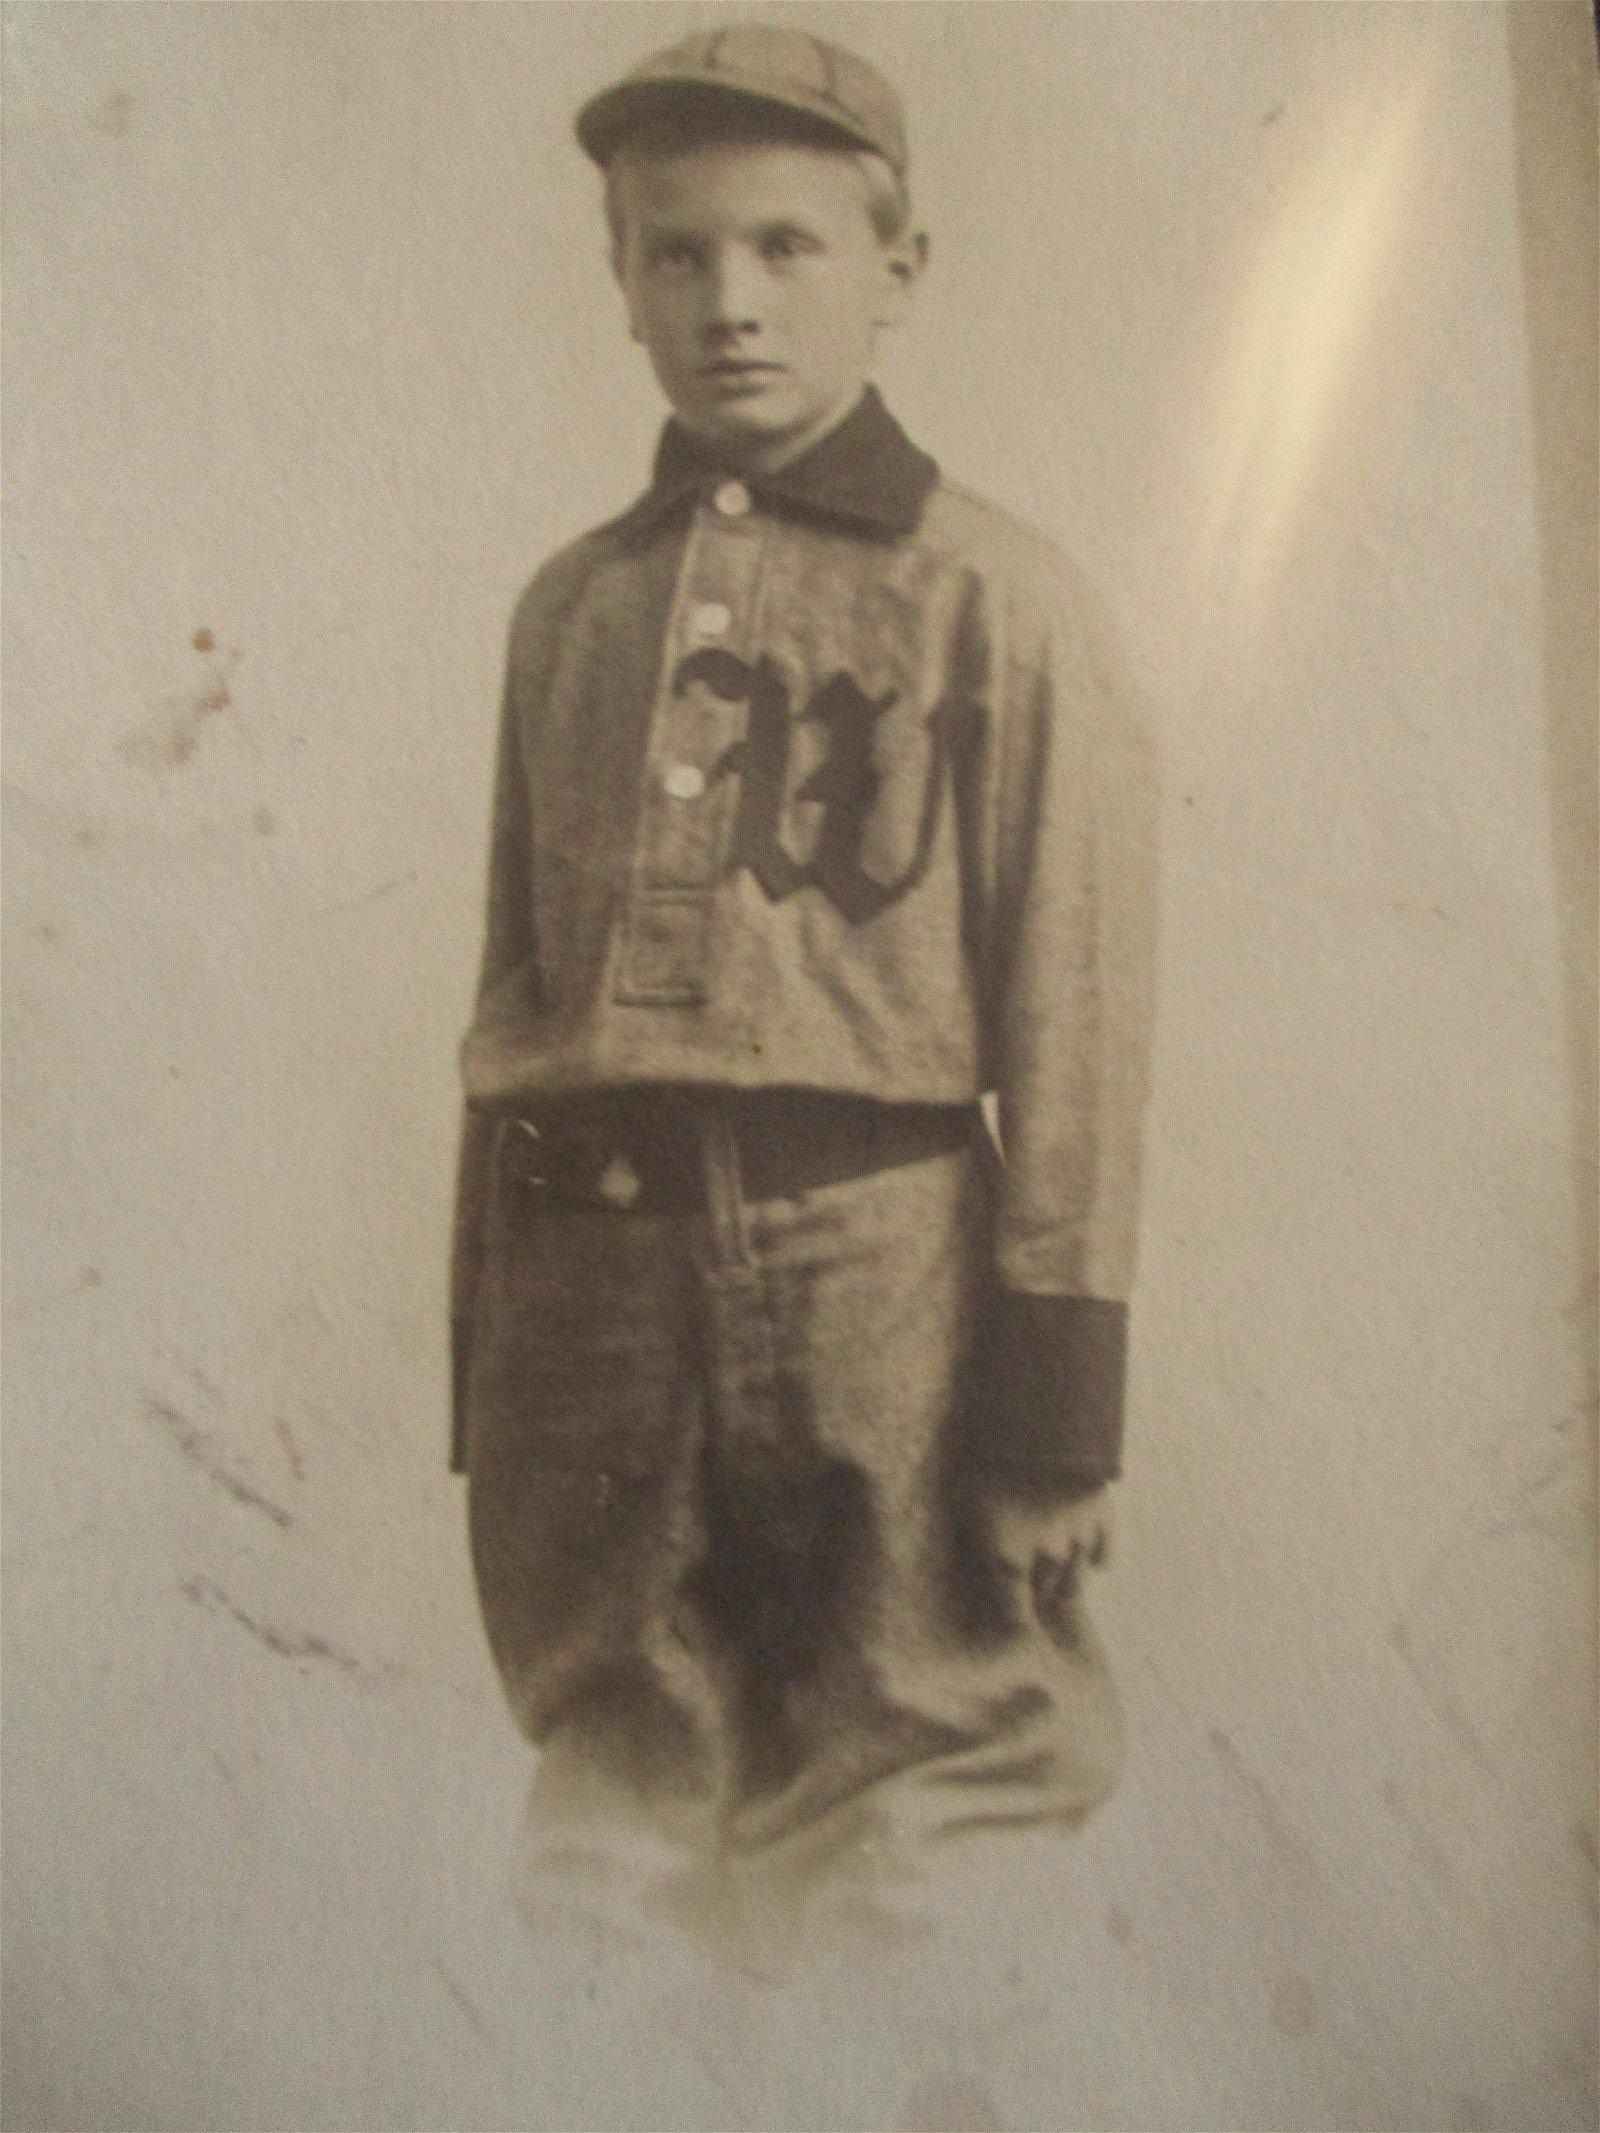 Rare Photo of Boy In Baseball Uniform